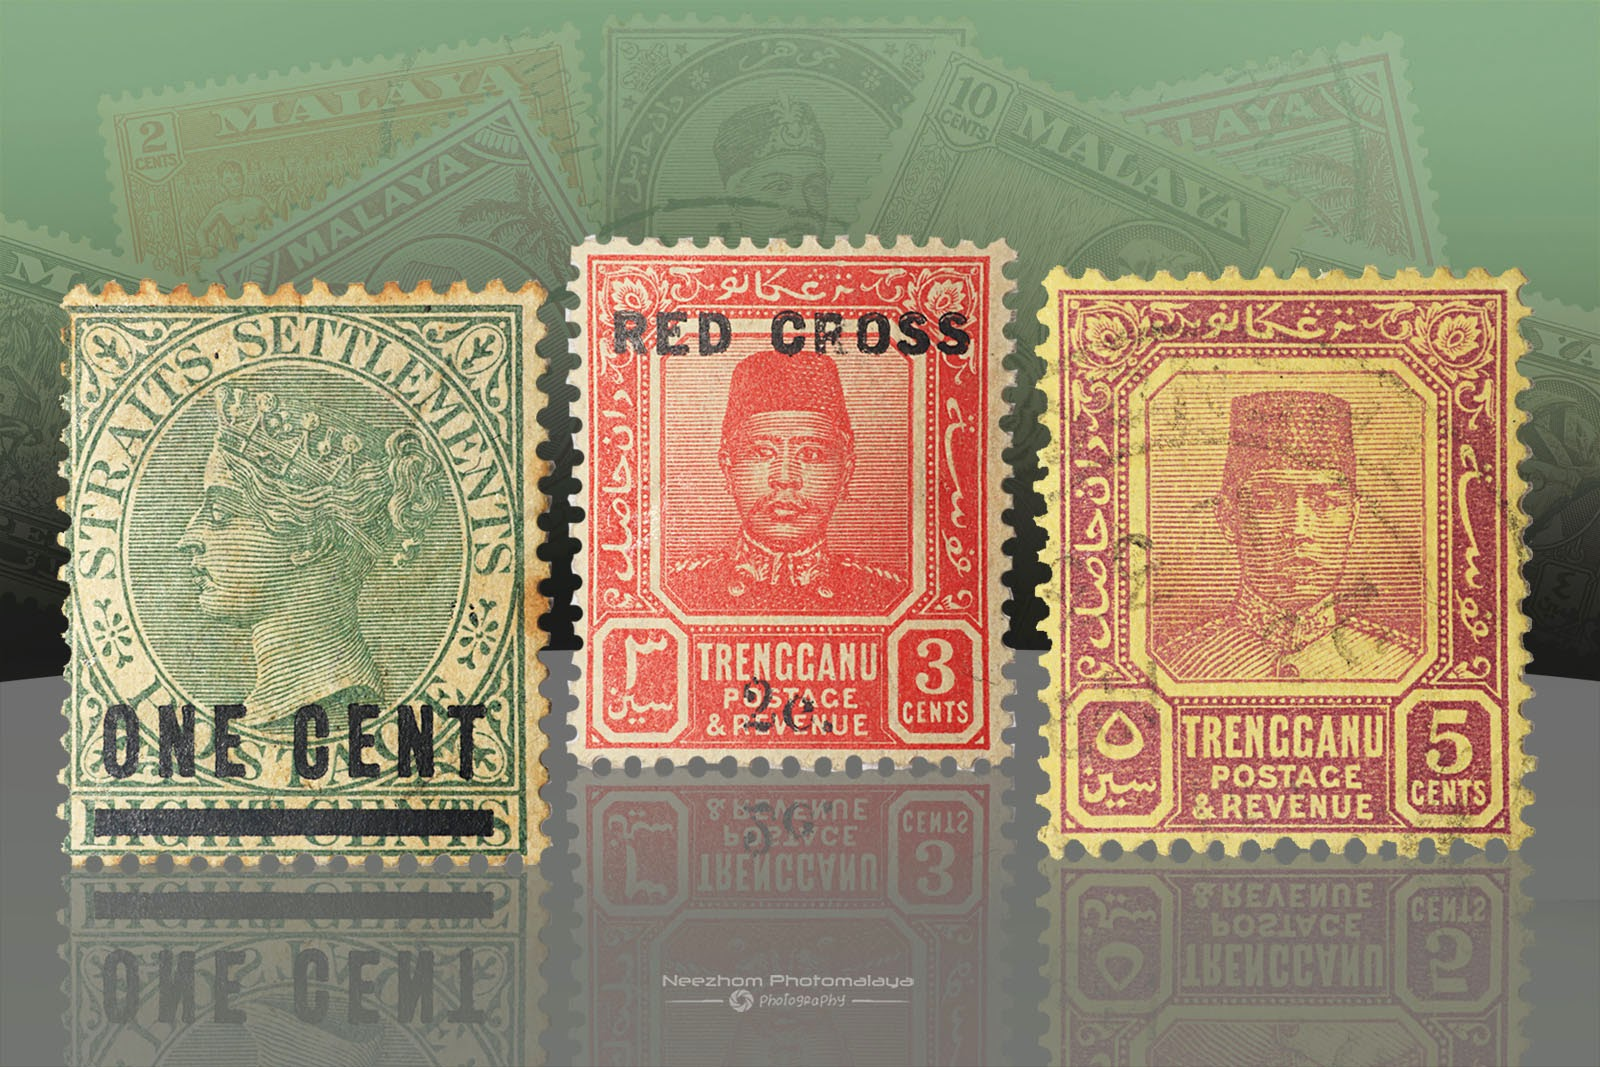 Malaya stamps - 1 Cent Straits Settlements 1892, 3 Cents Trengganu 1917, 5 Cents Trengganu 1924